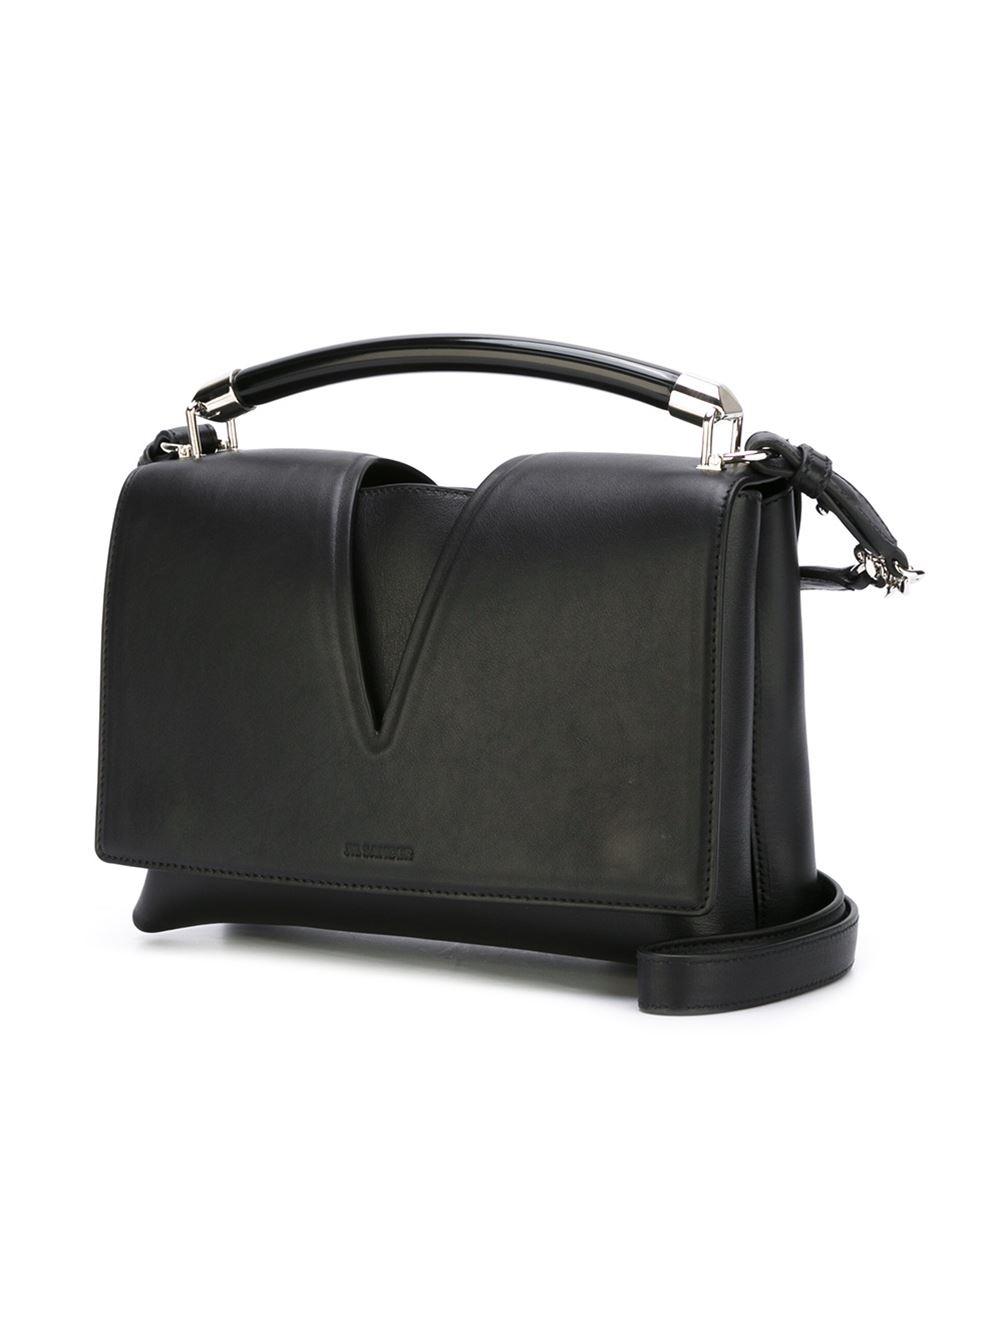 Jil Sander Small View Tube Leather Cross-Body Bag in Black